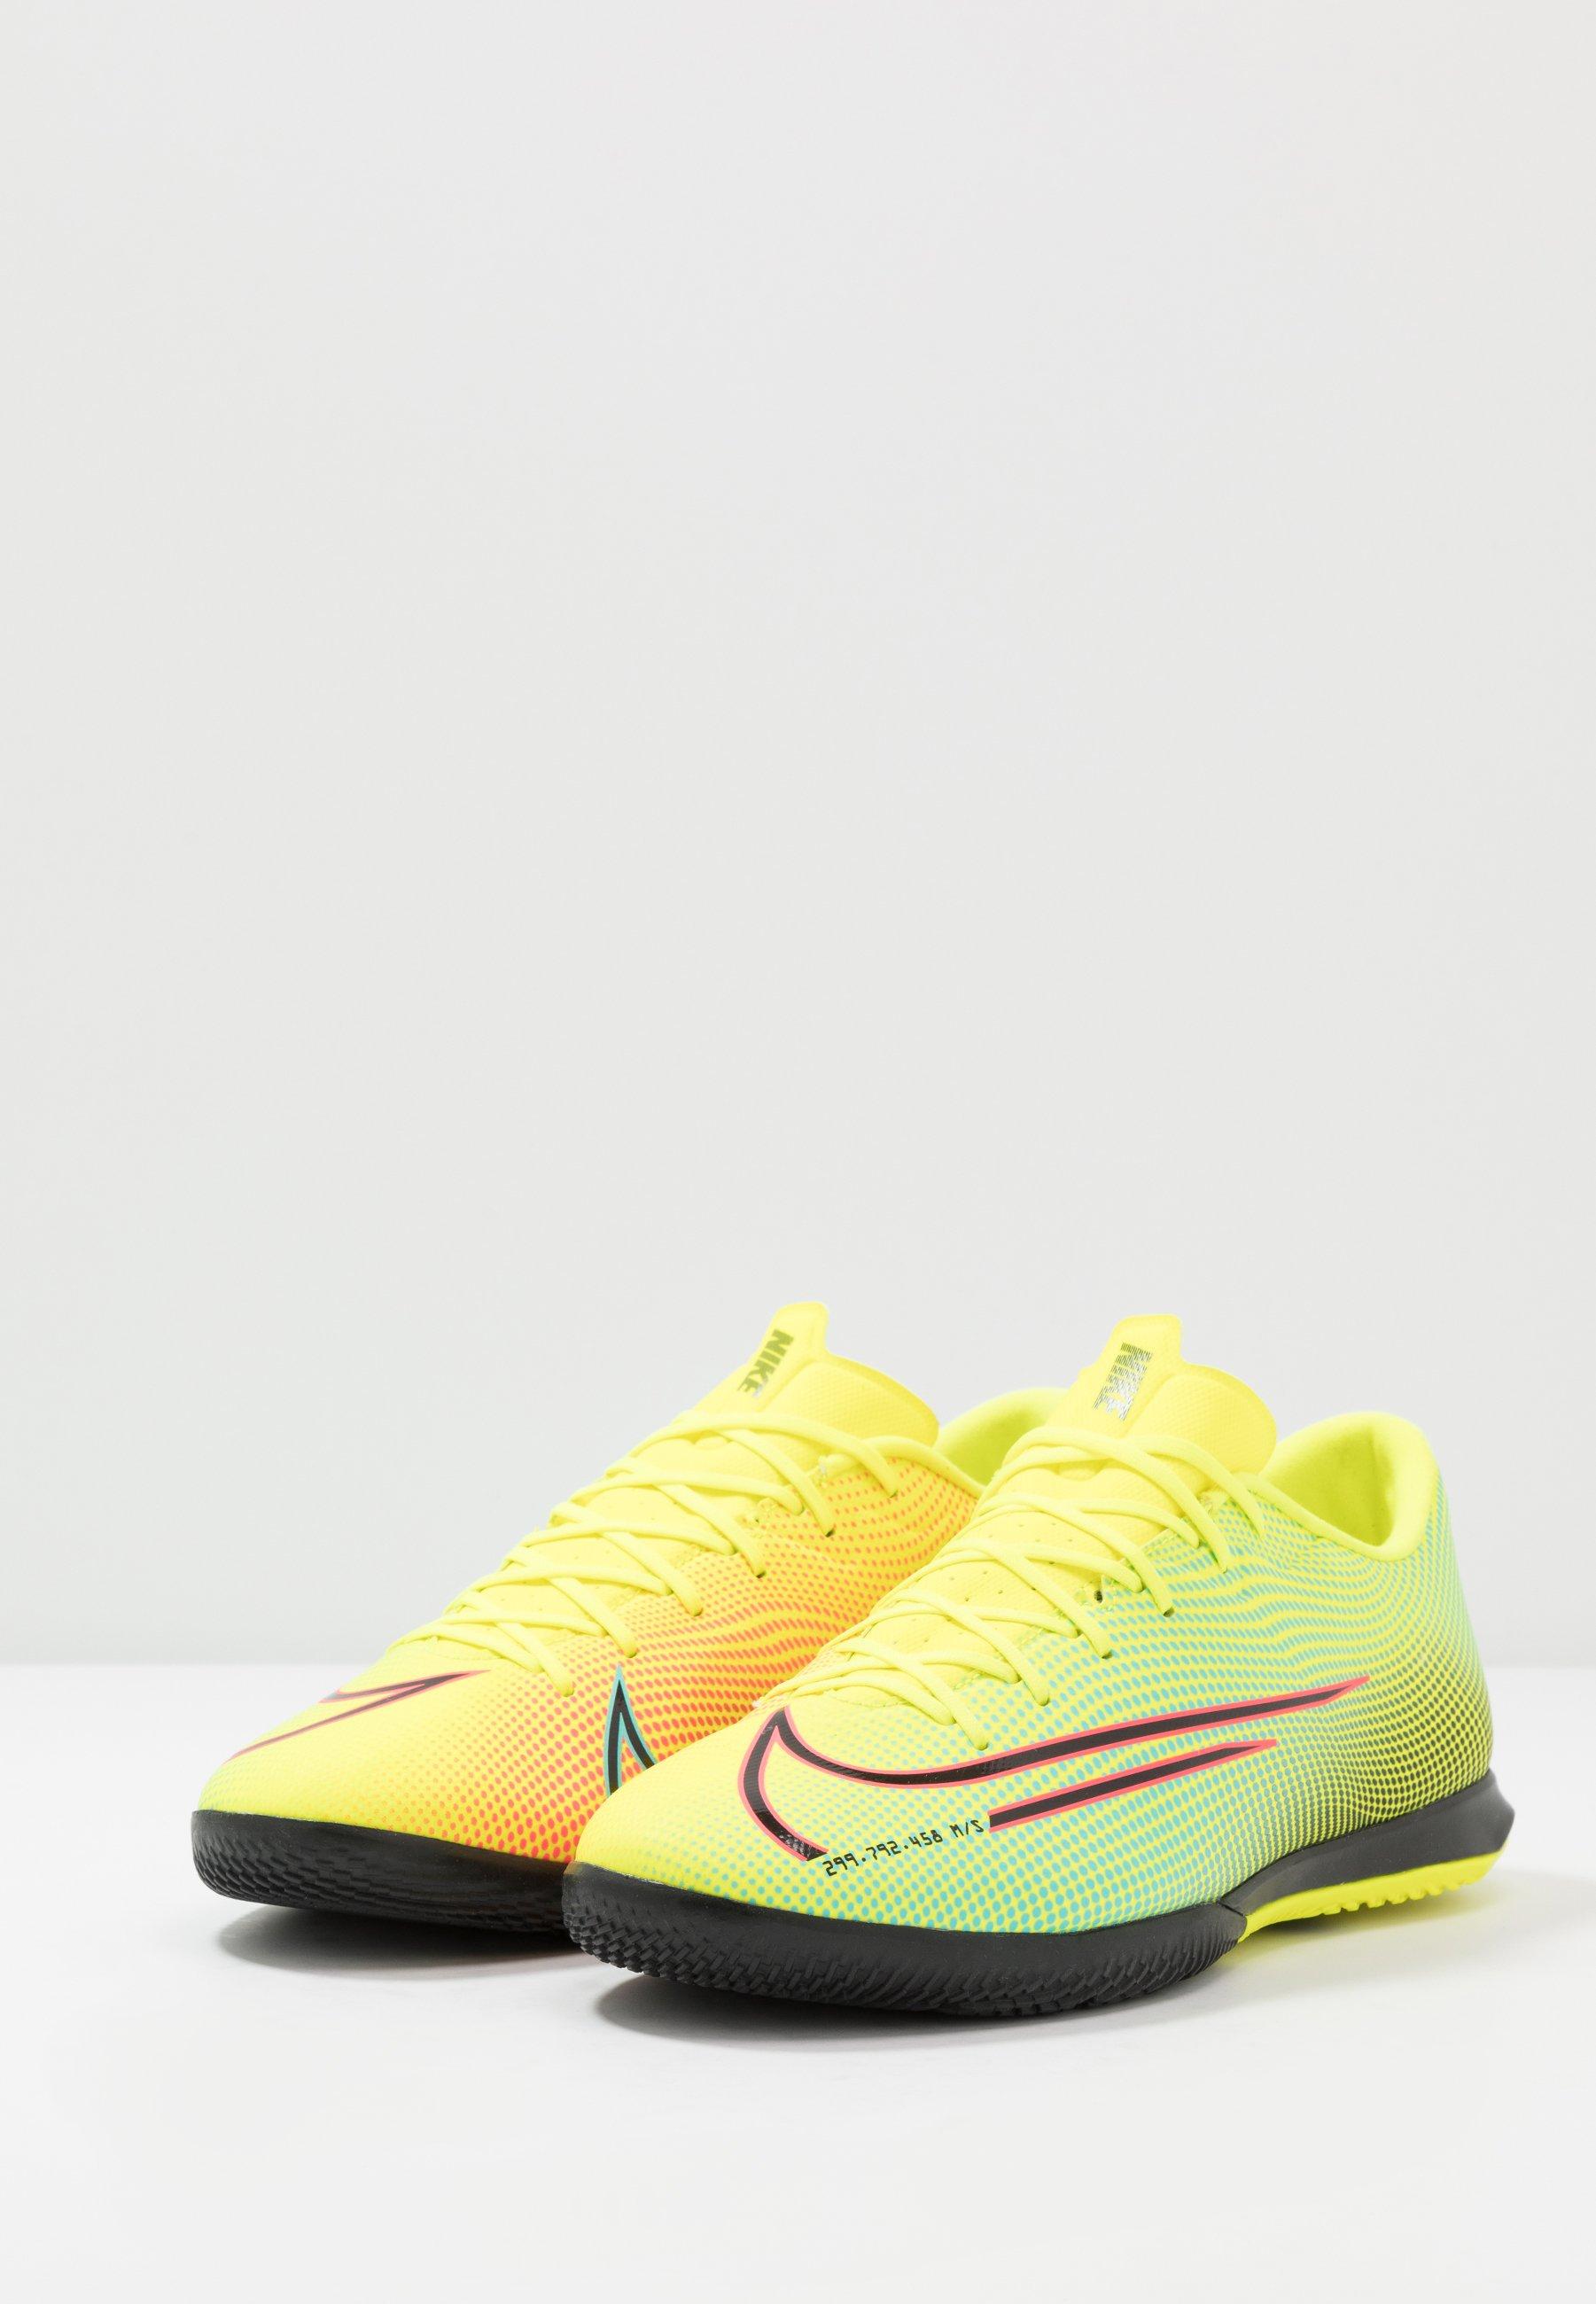 Nike Performance MERCURIAL VAPOR 13 ACADEMY MDS IC - Fußballschuh Halle - lemon/black/aurora green/gelb - Herrenschuhe yKnyJ